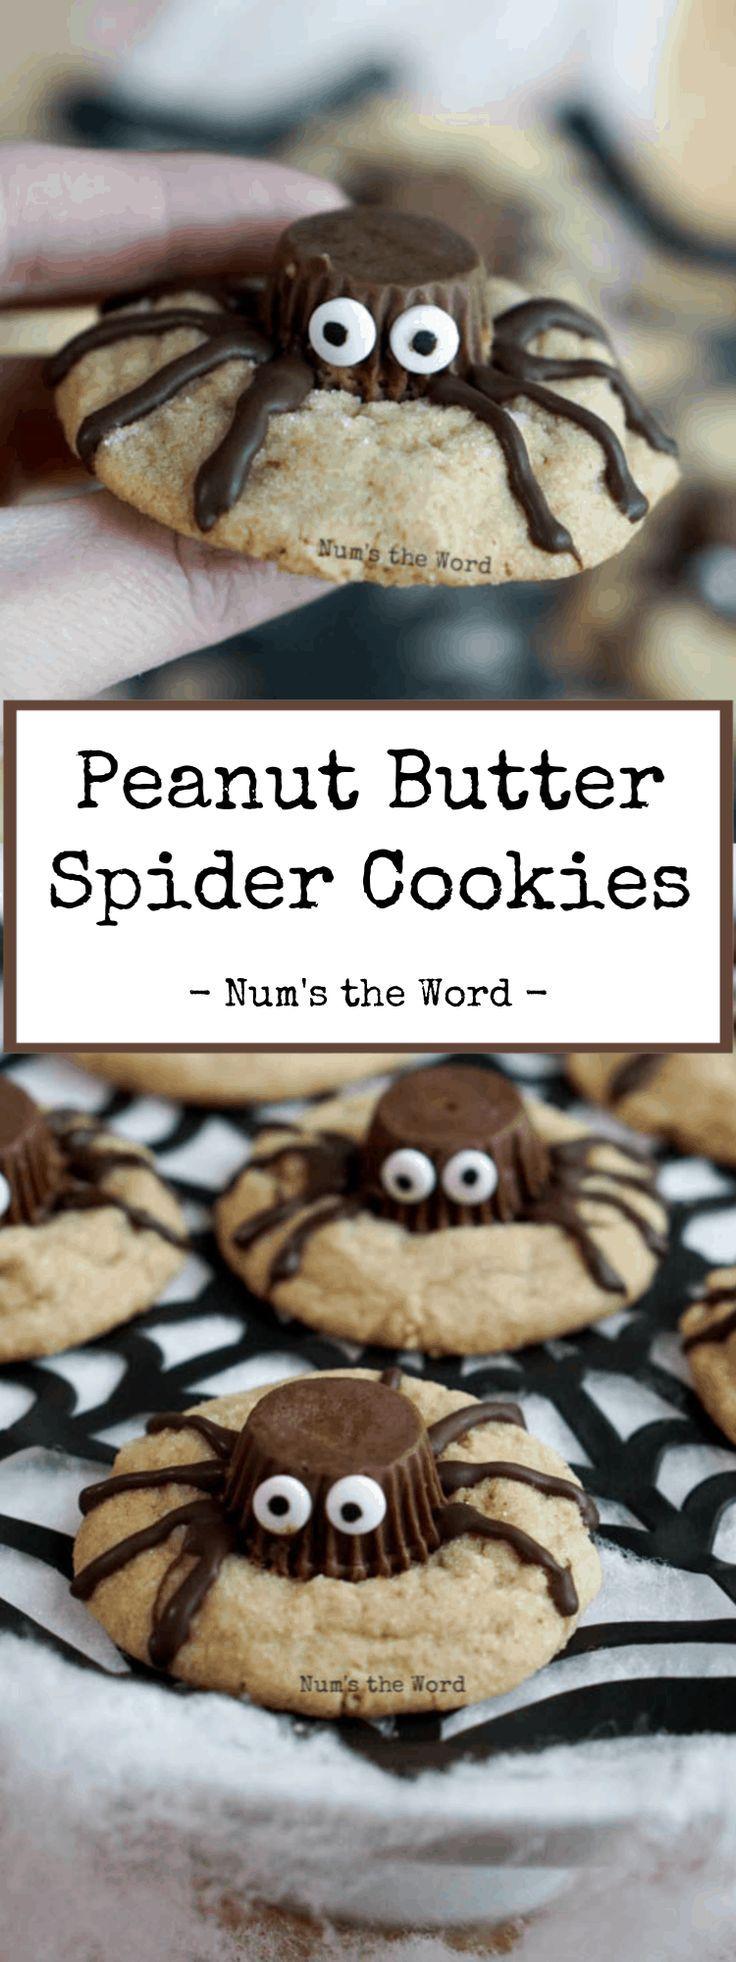 Spider Cookies for Halloween [peanut butter cookies] - Num's the Word